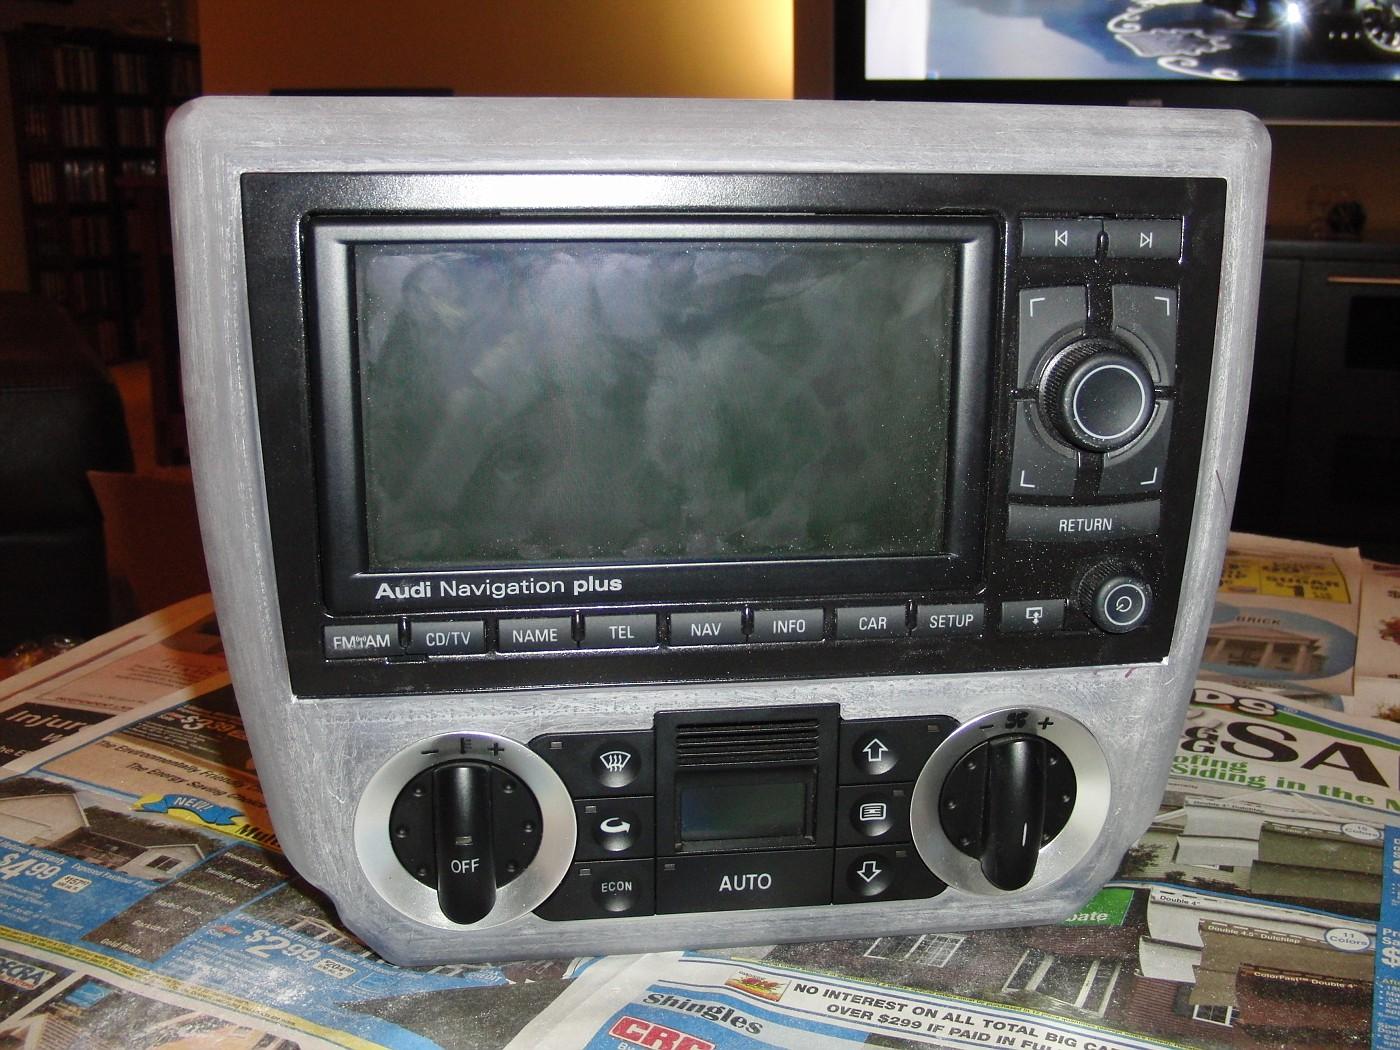 Audi Tt 2 Din In Dash Dvd Gps Navigation Systems